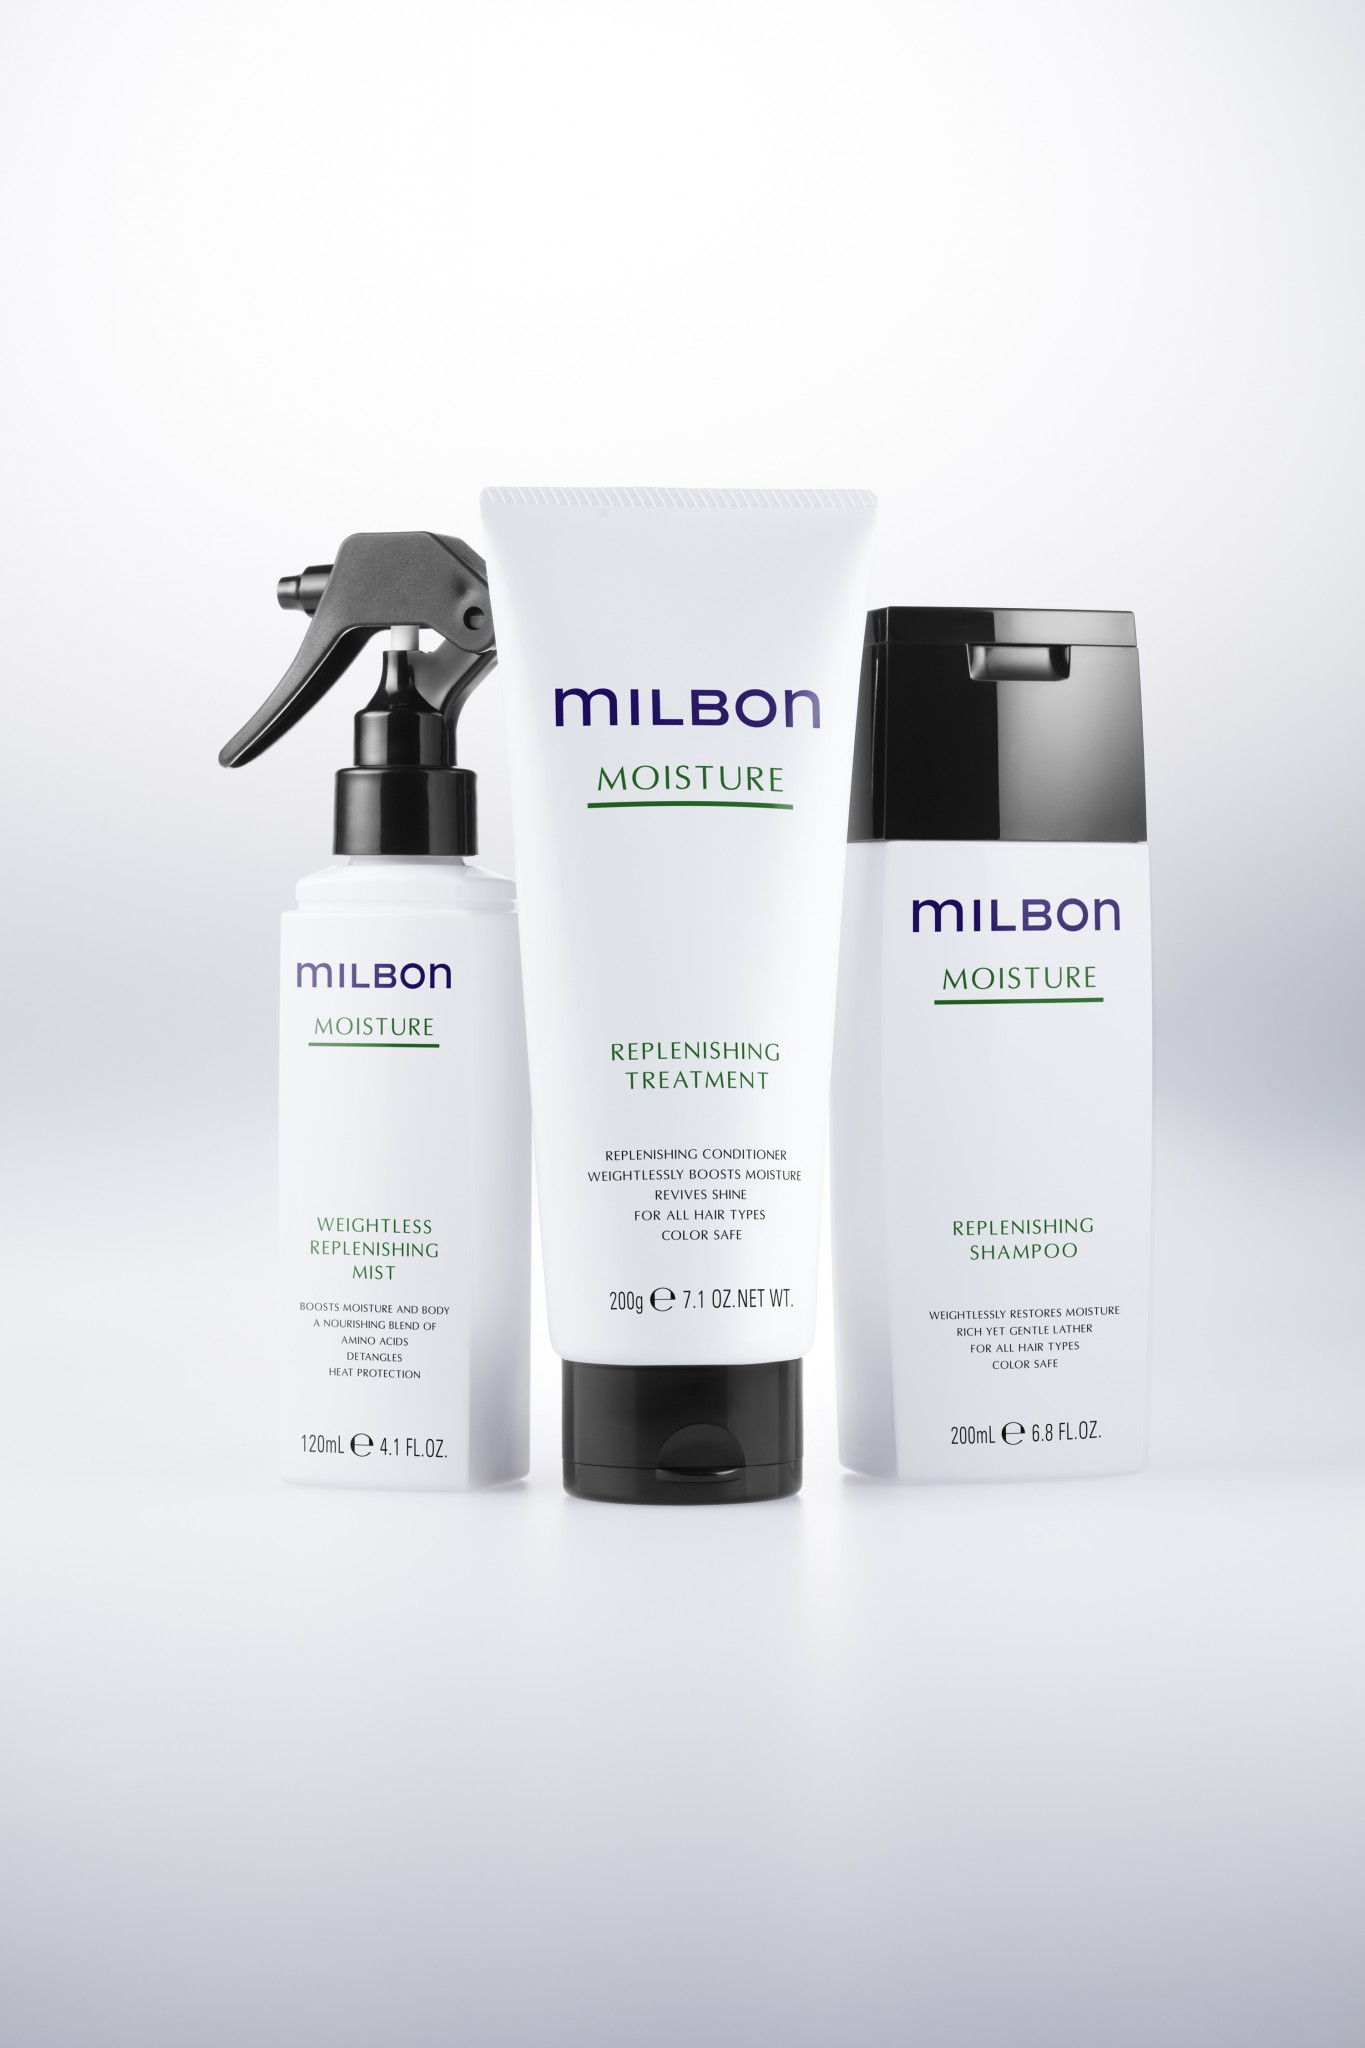 MOISTURE ミルボン[mILBON]3タイプ